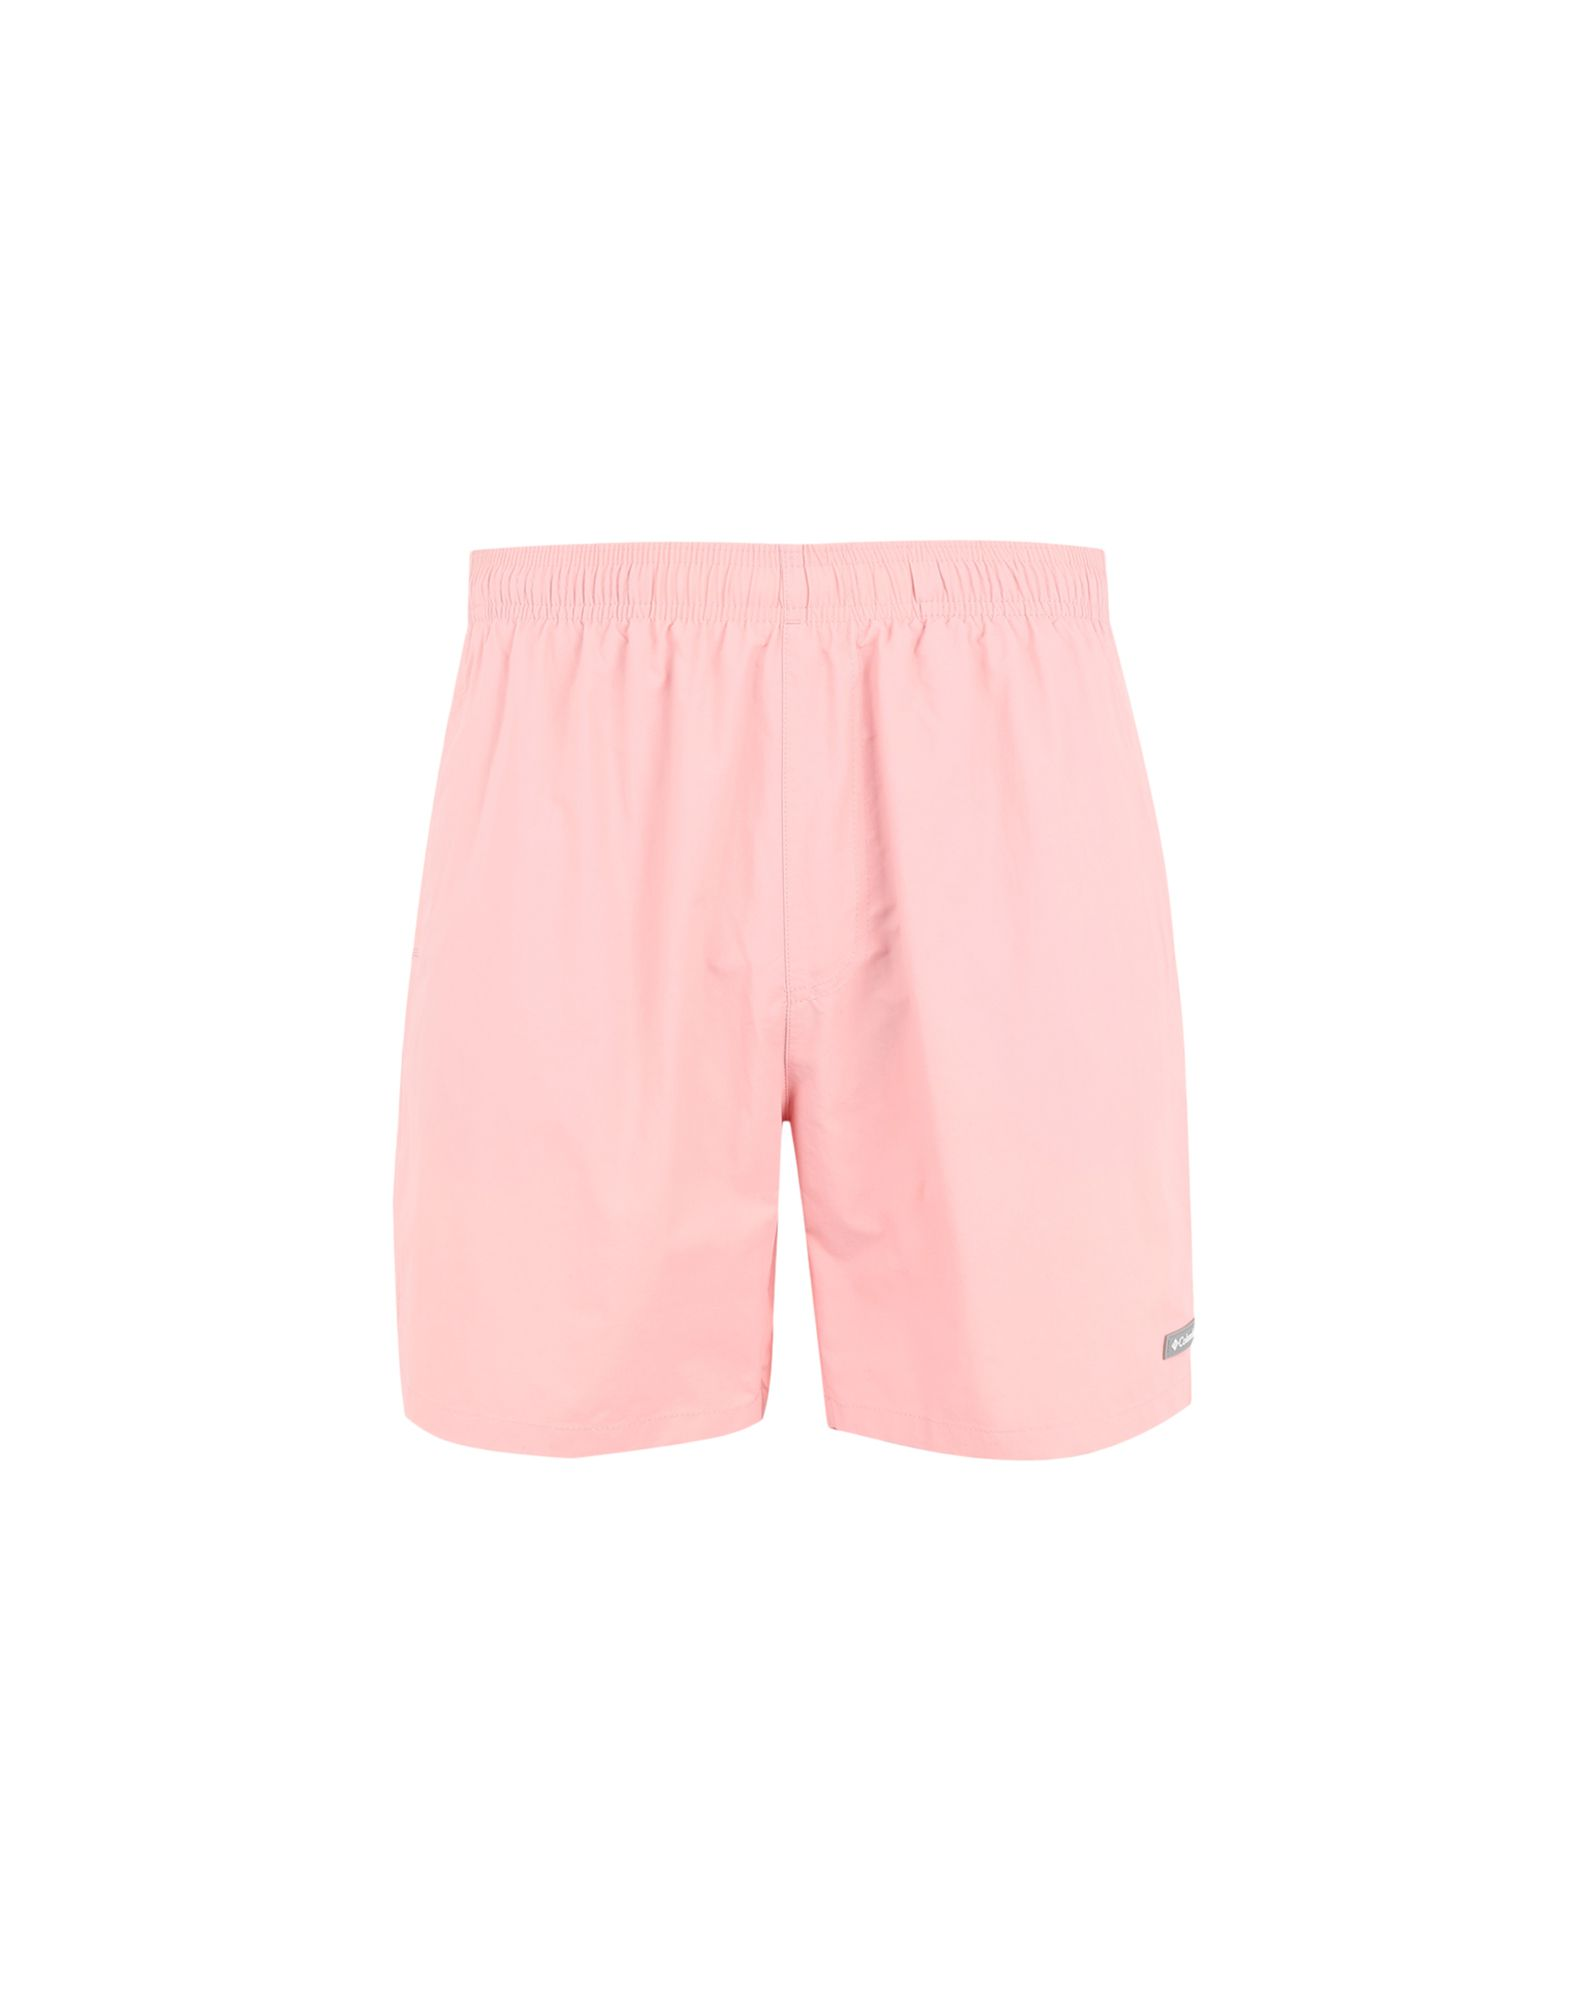 e285123303 Buy columbia swimwear for men - Best men's columbia swimwear shop ...